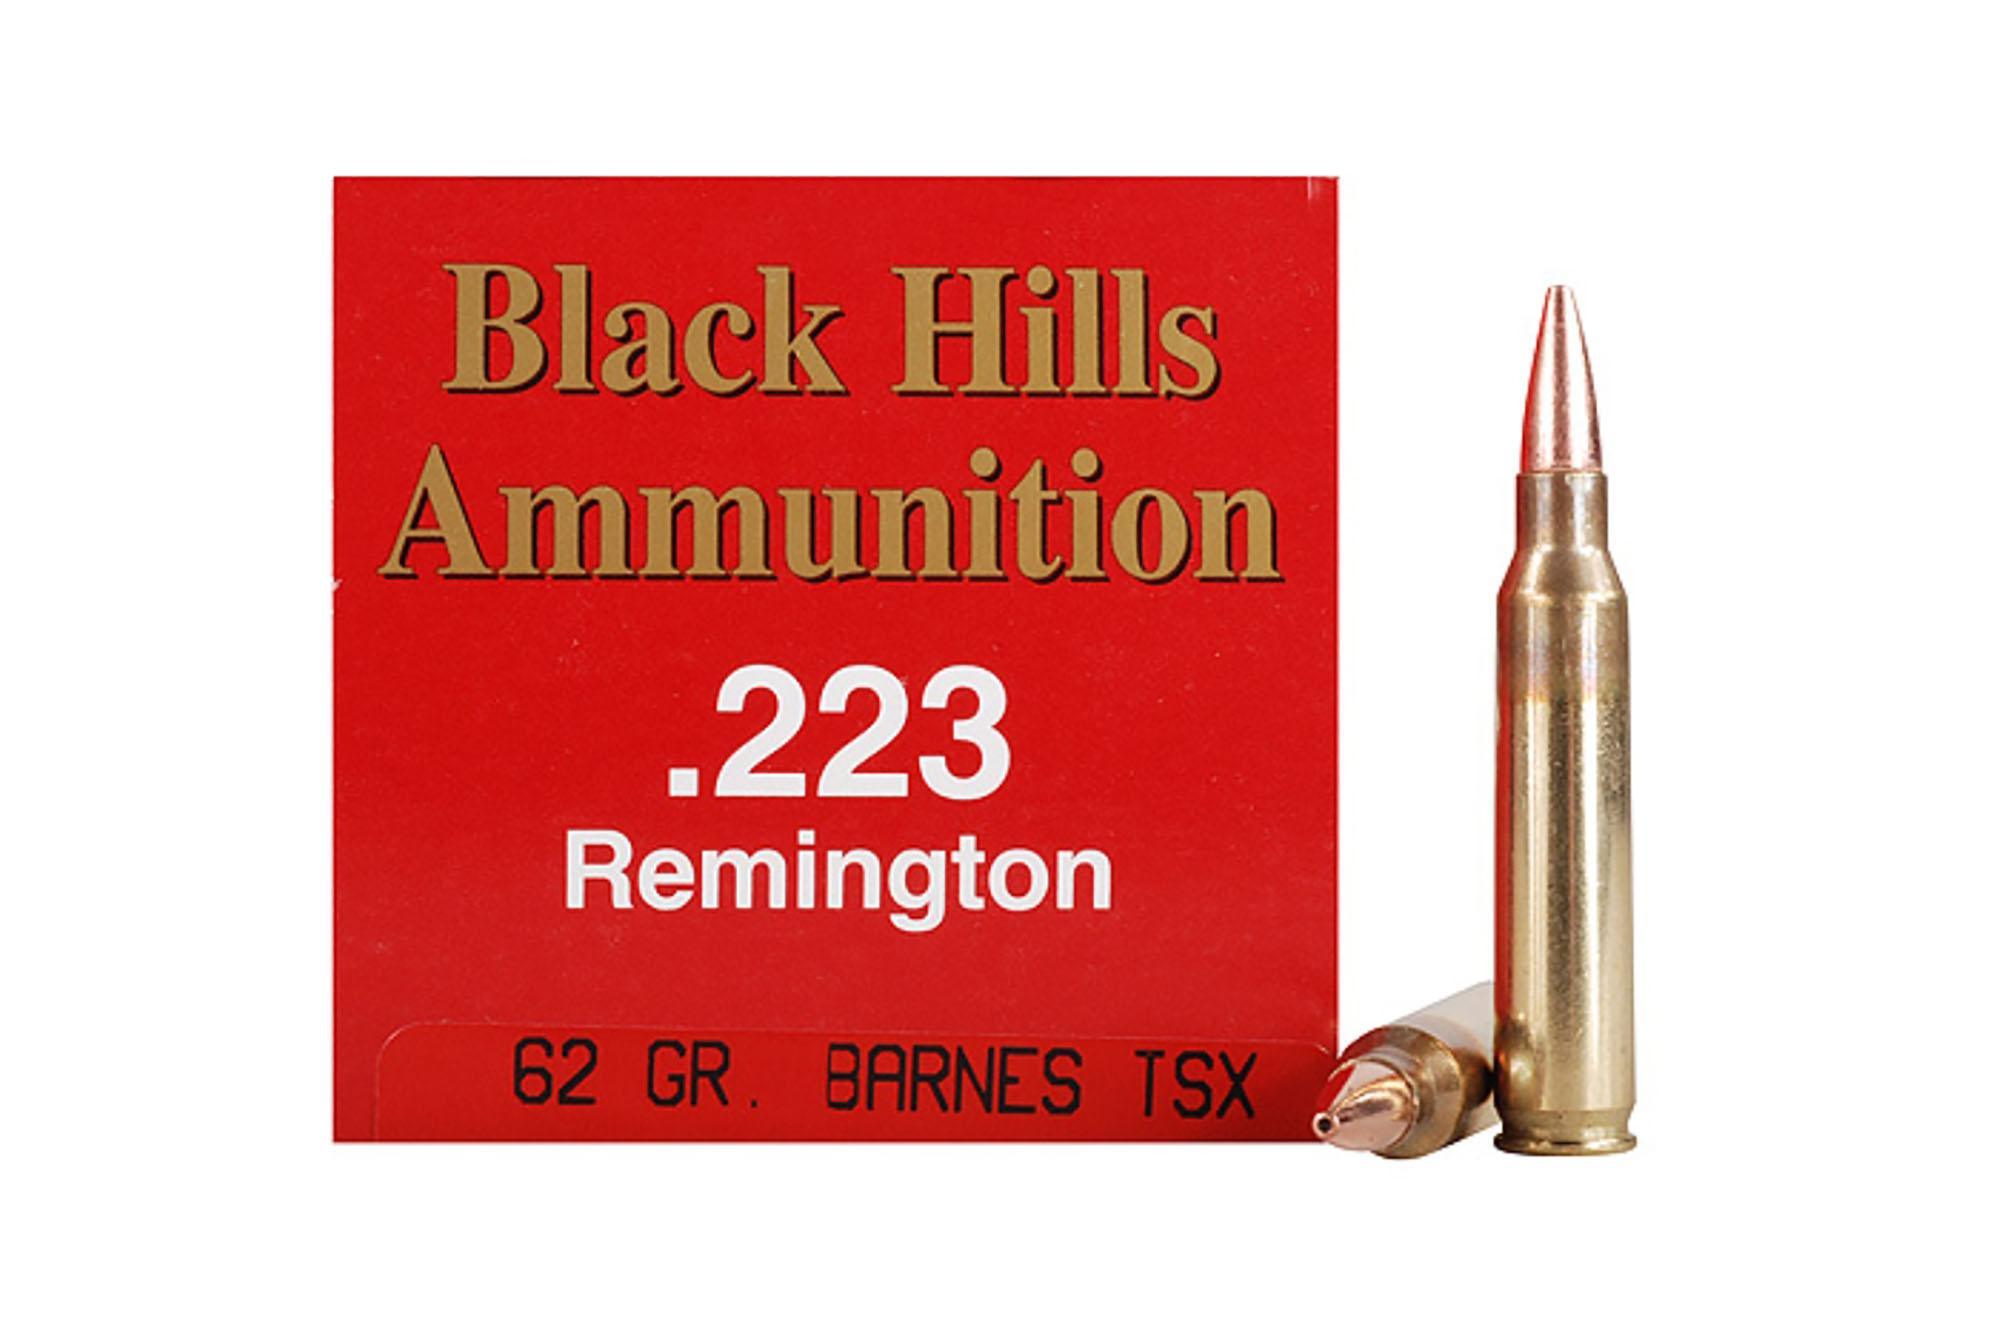 Black Hills Ammunition .223 Remington 62 gr Barnes TSX ...